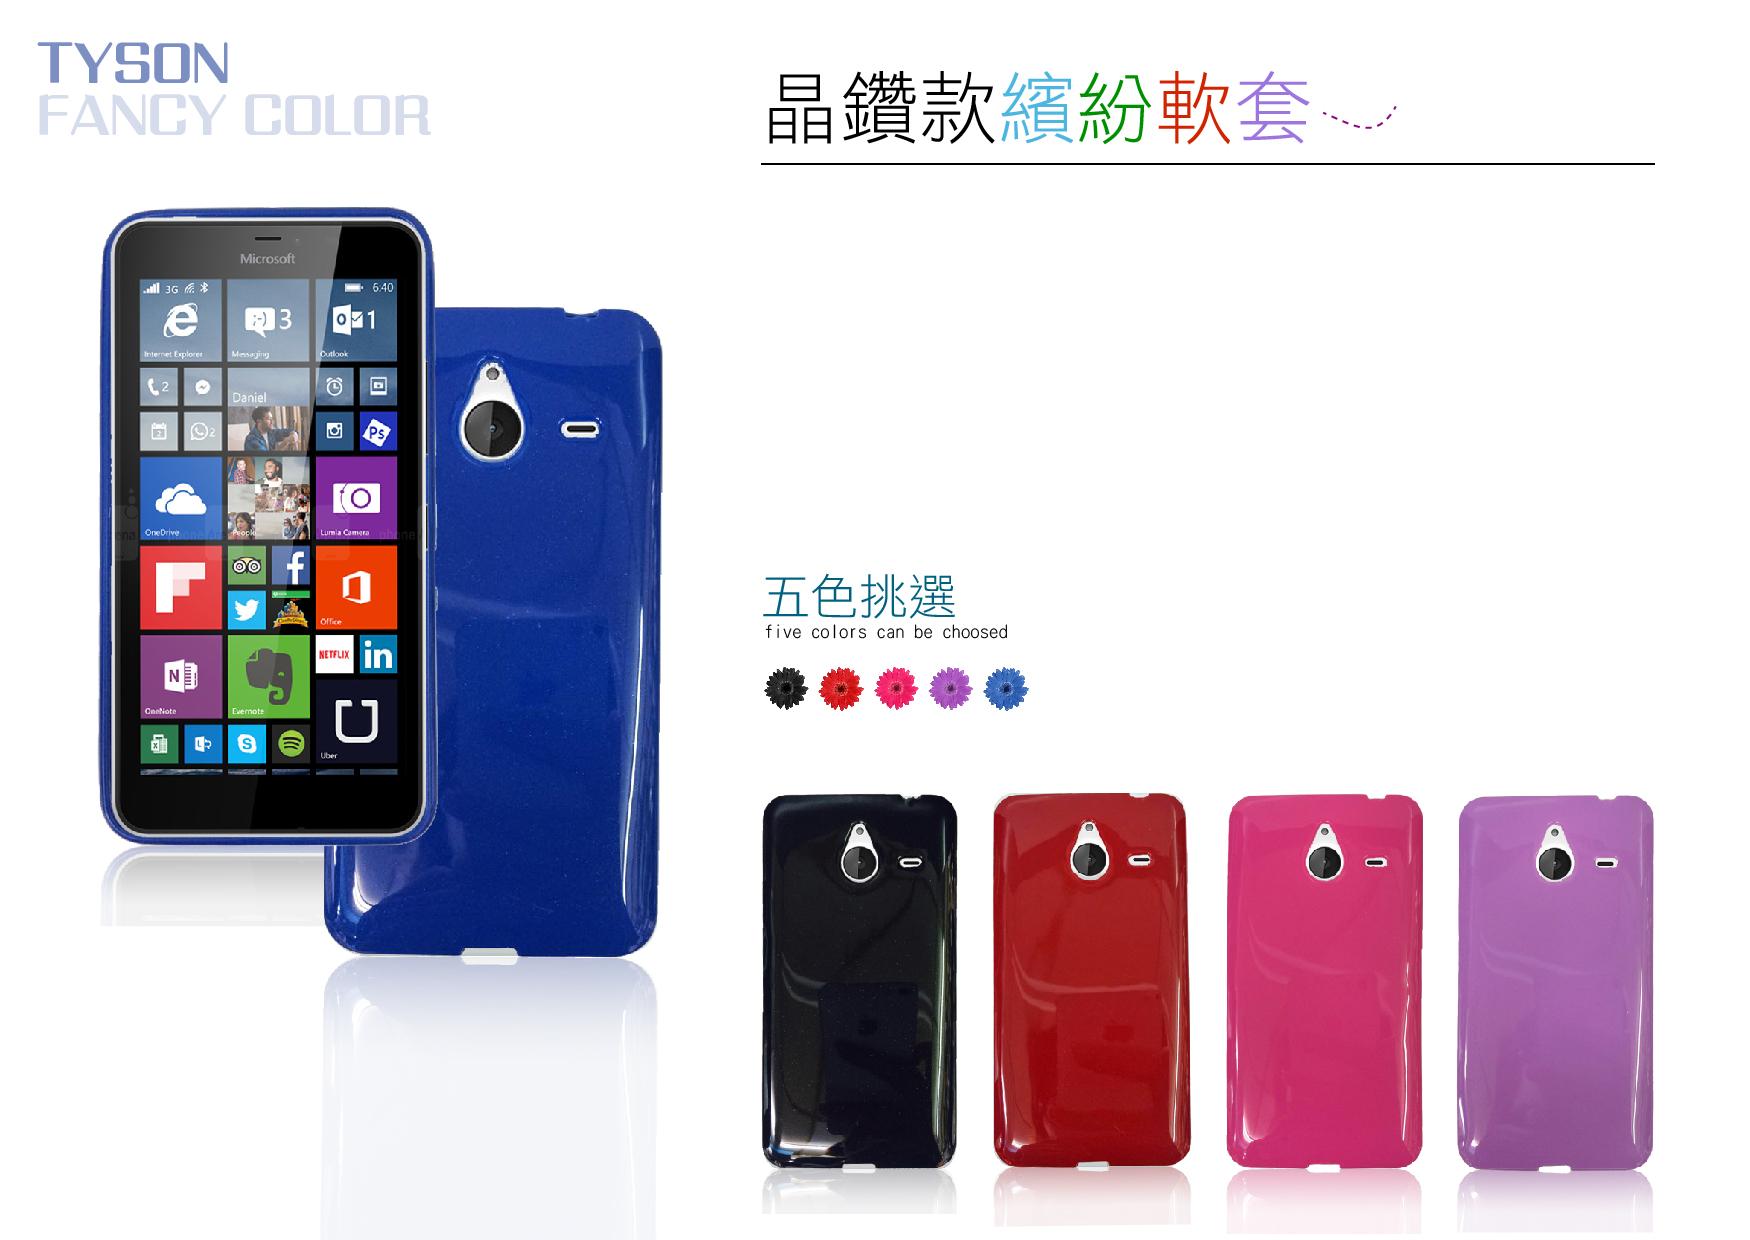 LG K10 繽紛晶鑽 保護軟殼 手機套 背蓋 果凍套 背套